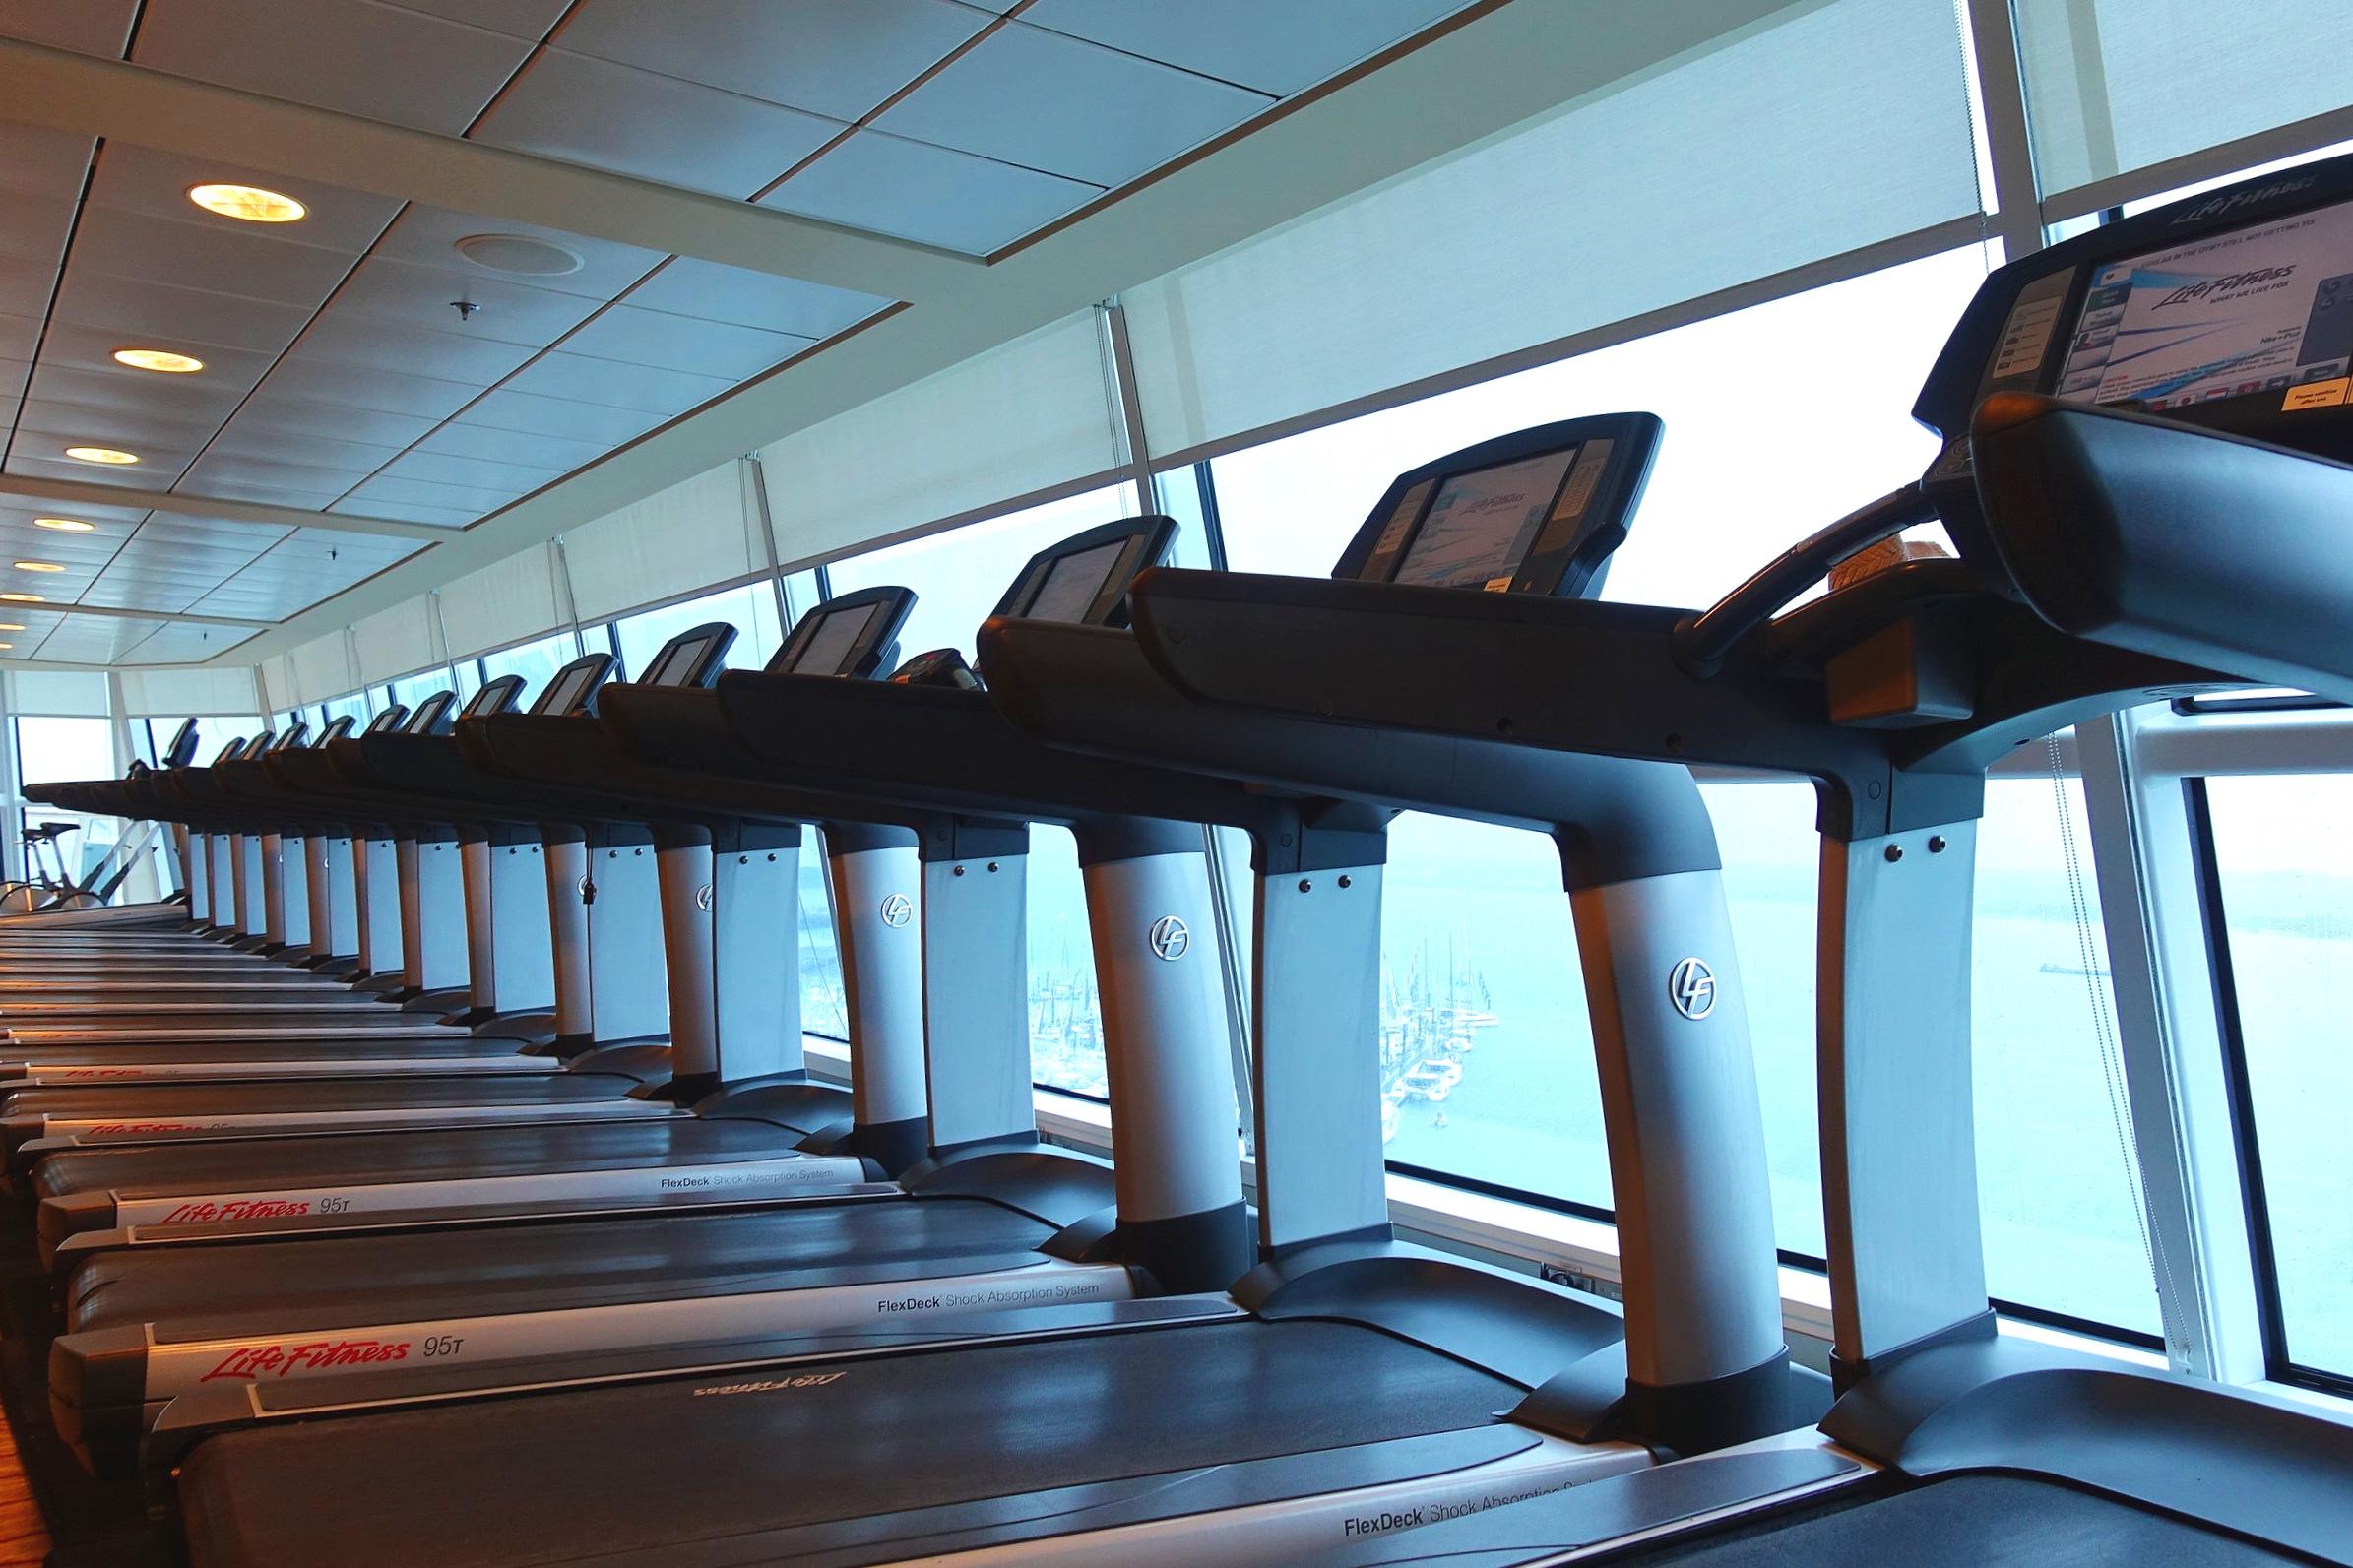 Plenty of treadmills.